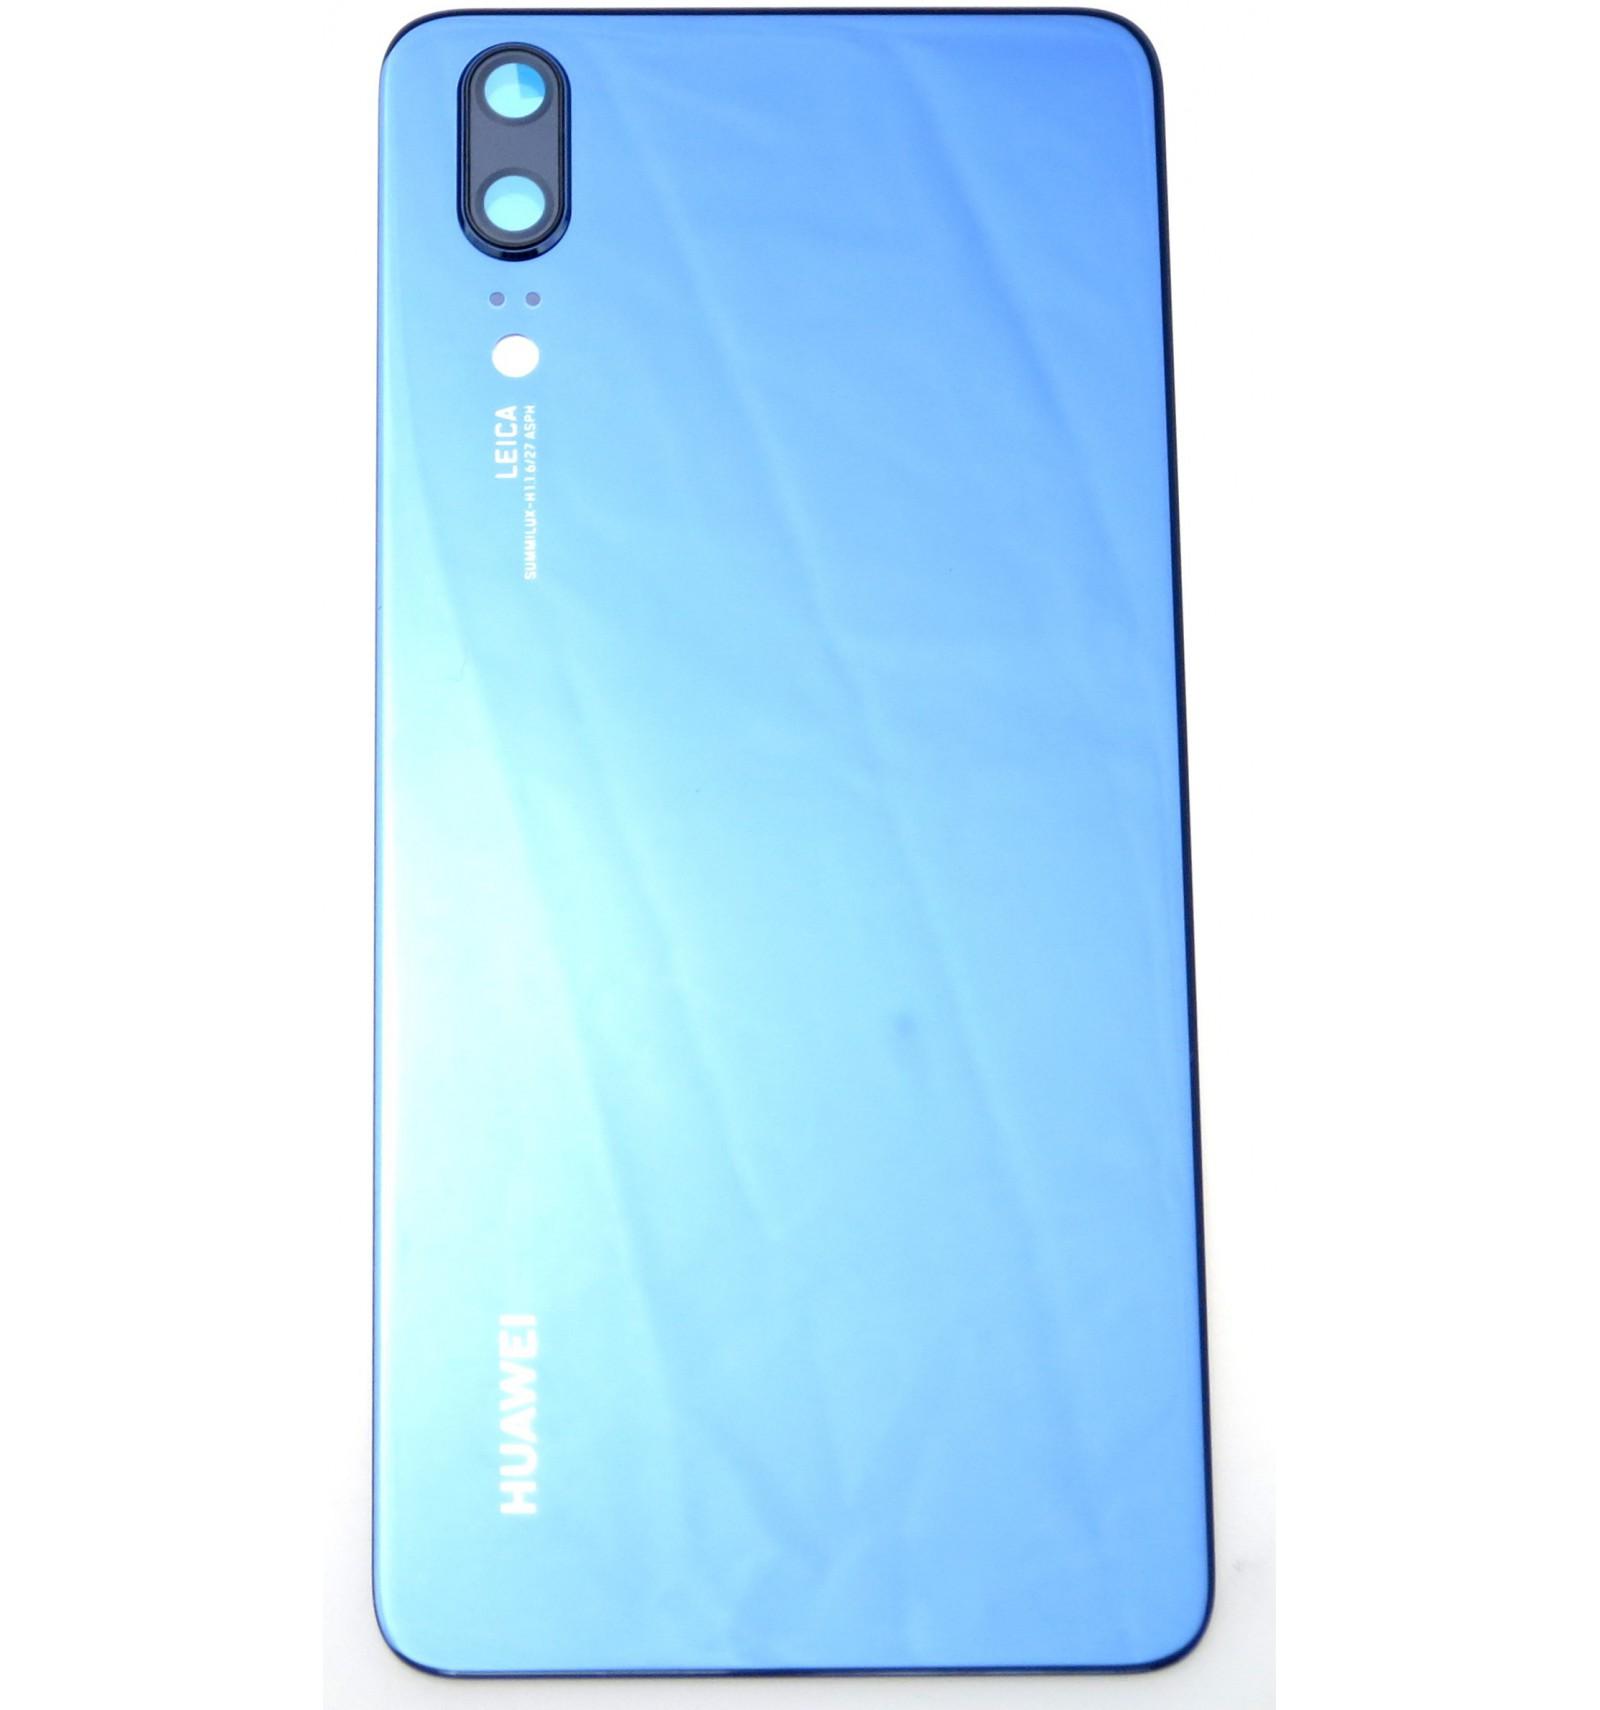 Kryt zadný modrá originál na Huawei P20 02351WKU  105f3a6d708